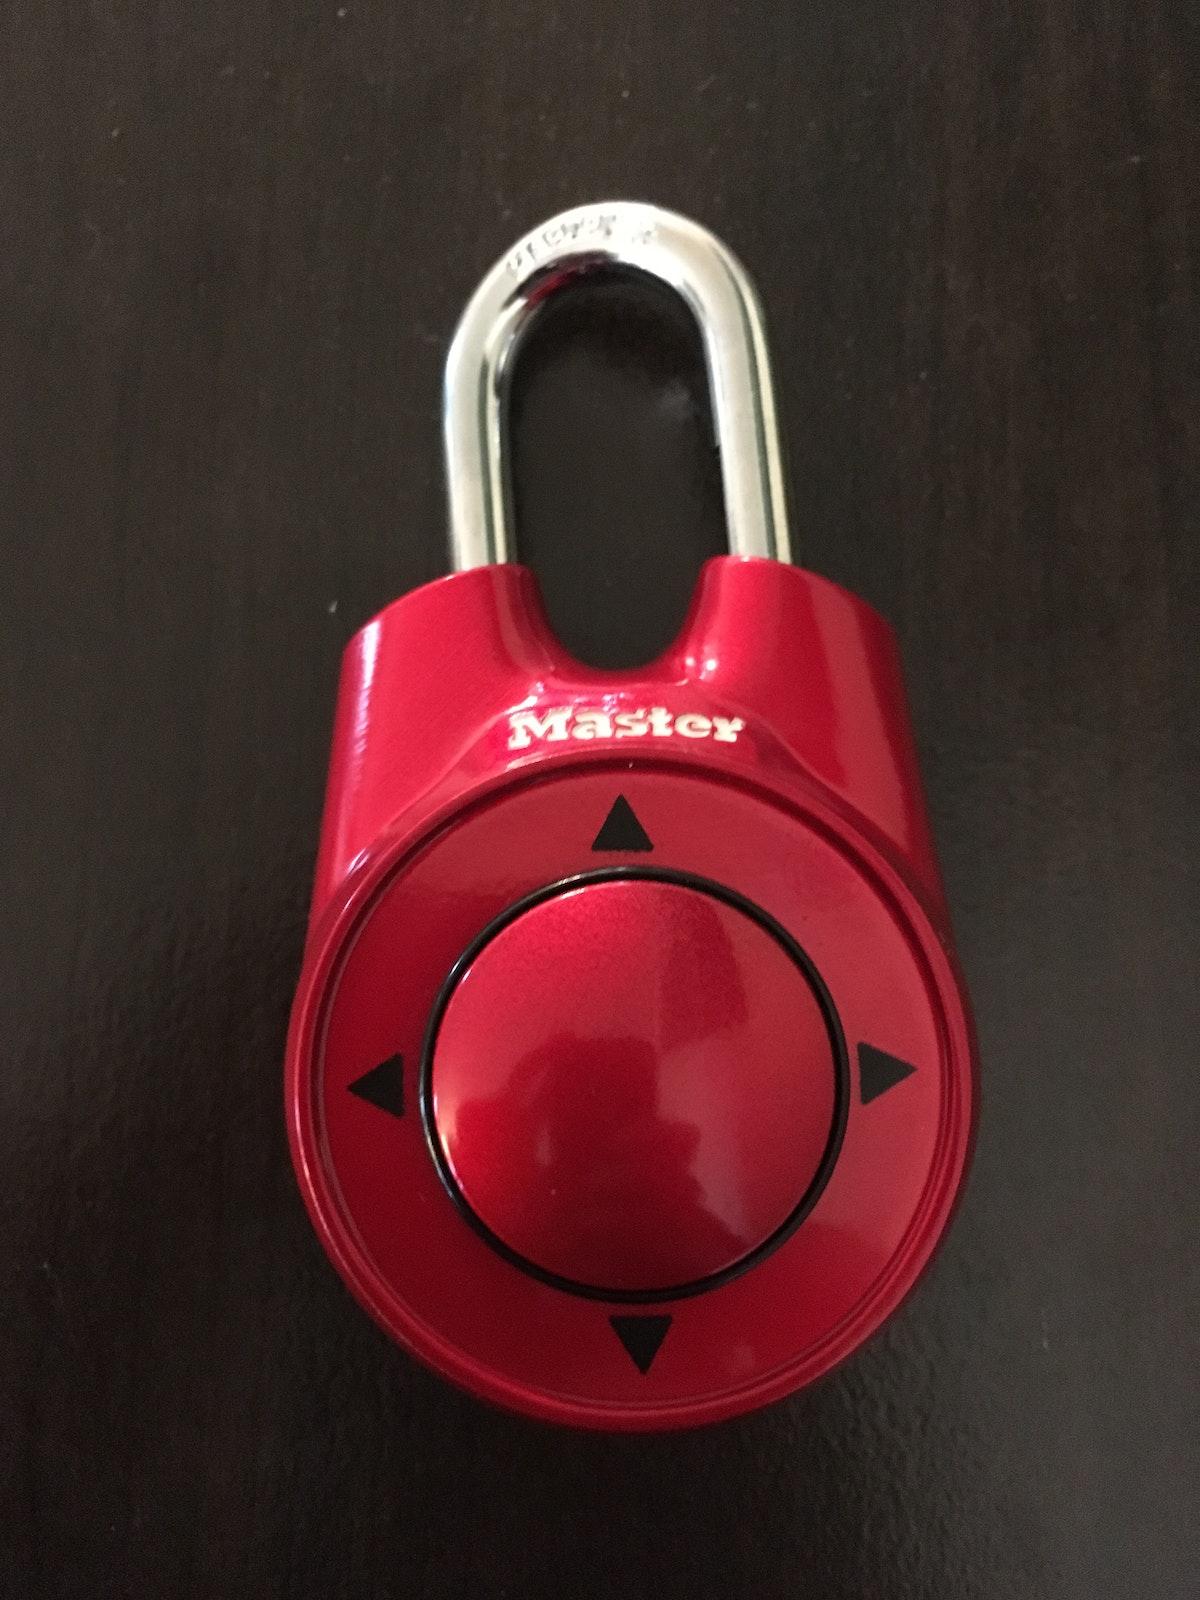 Red directional Master padlock